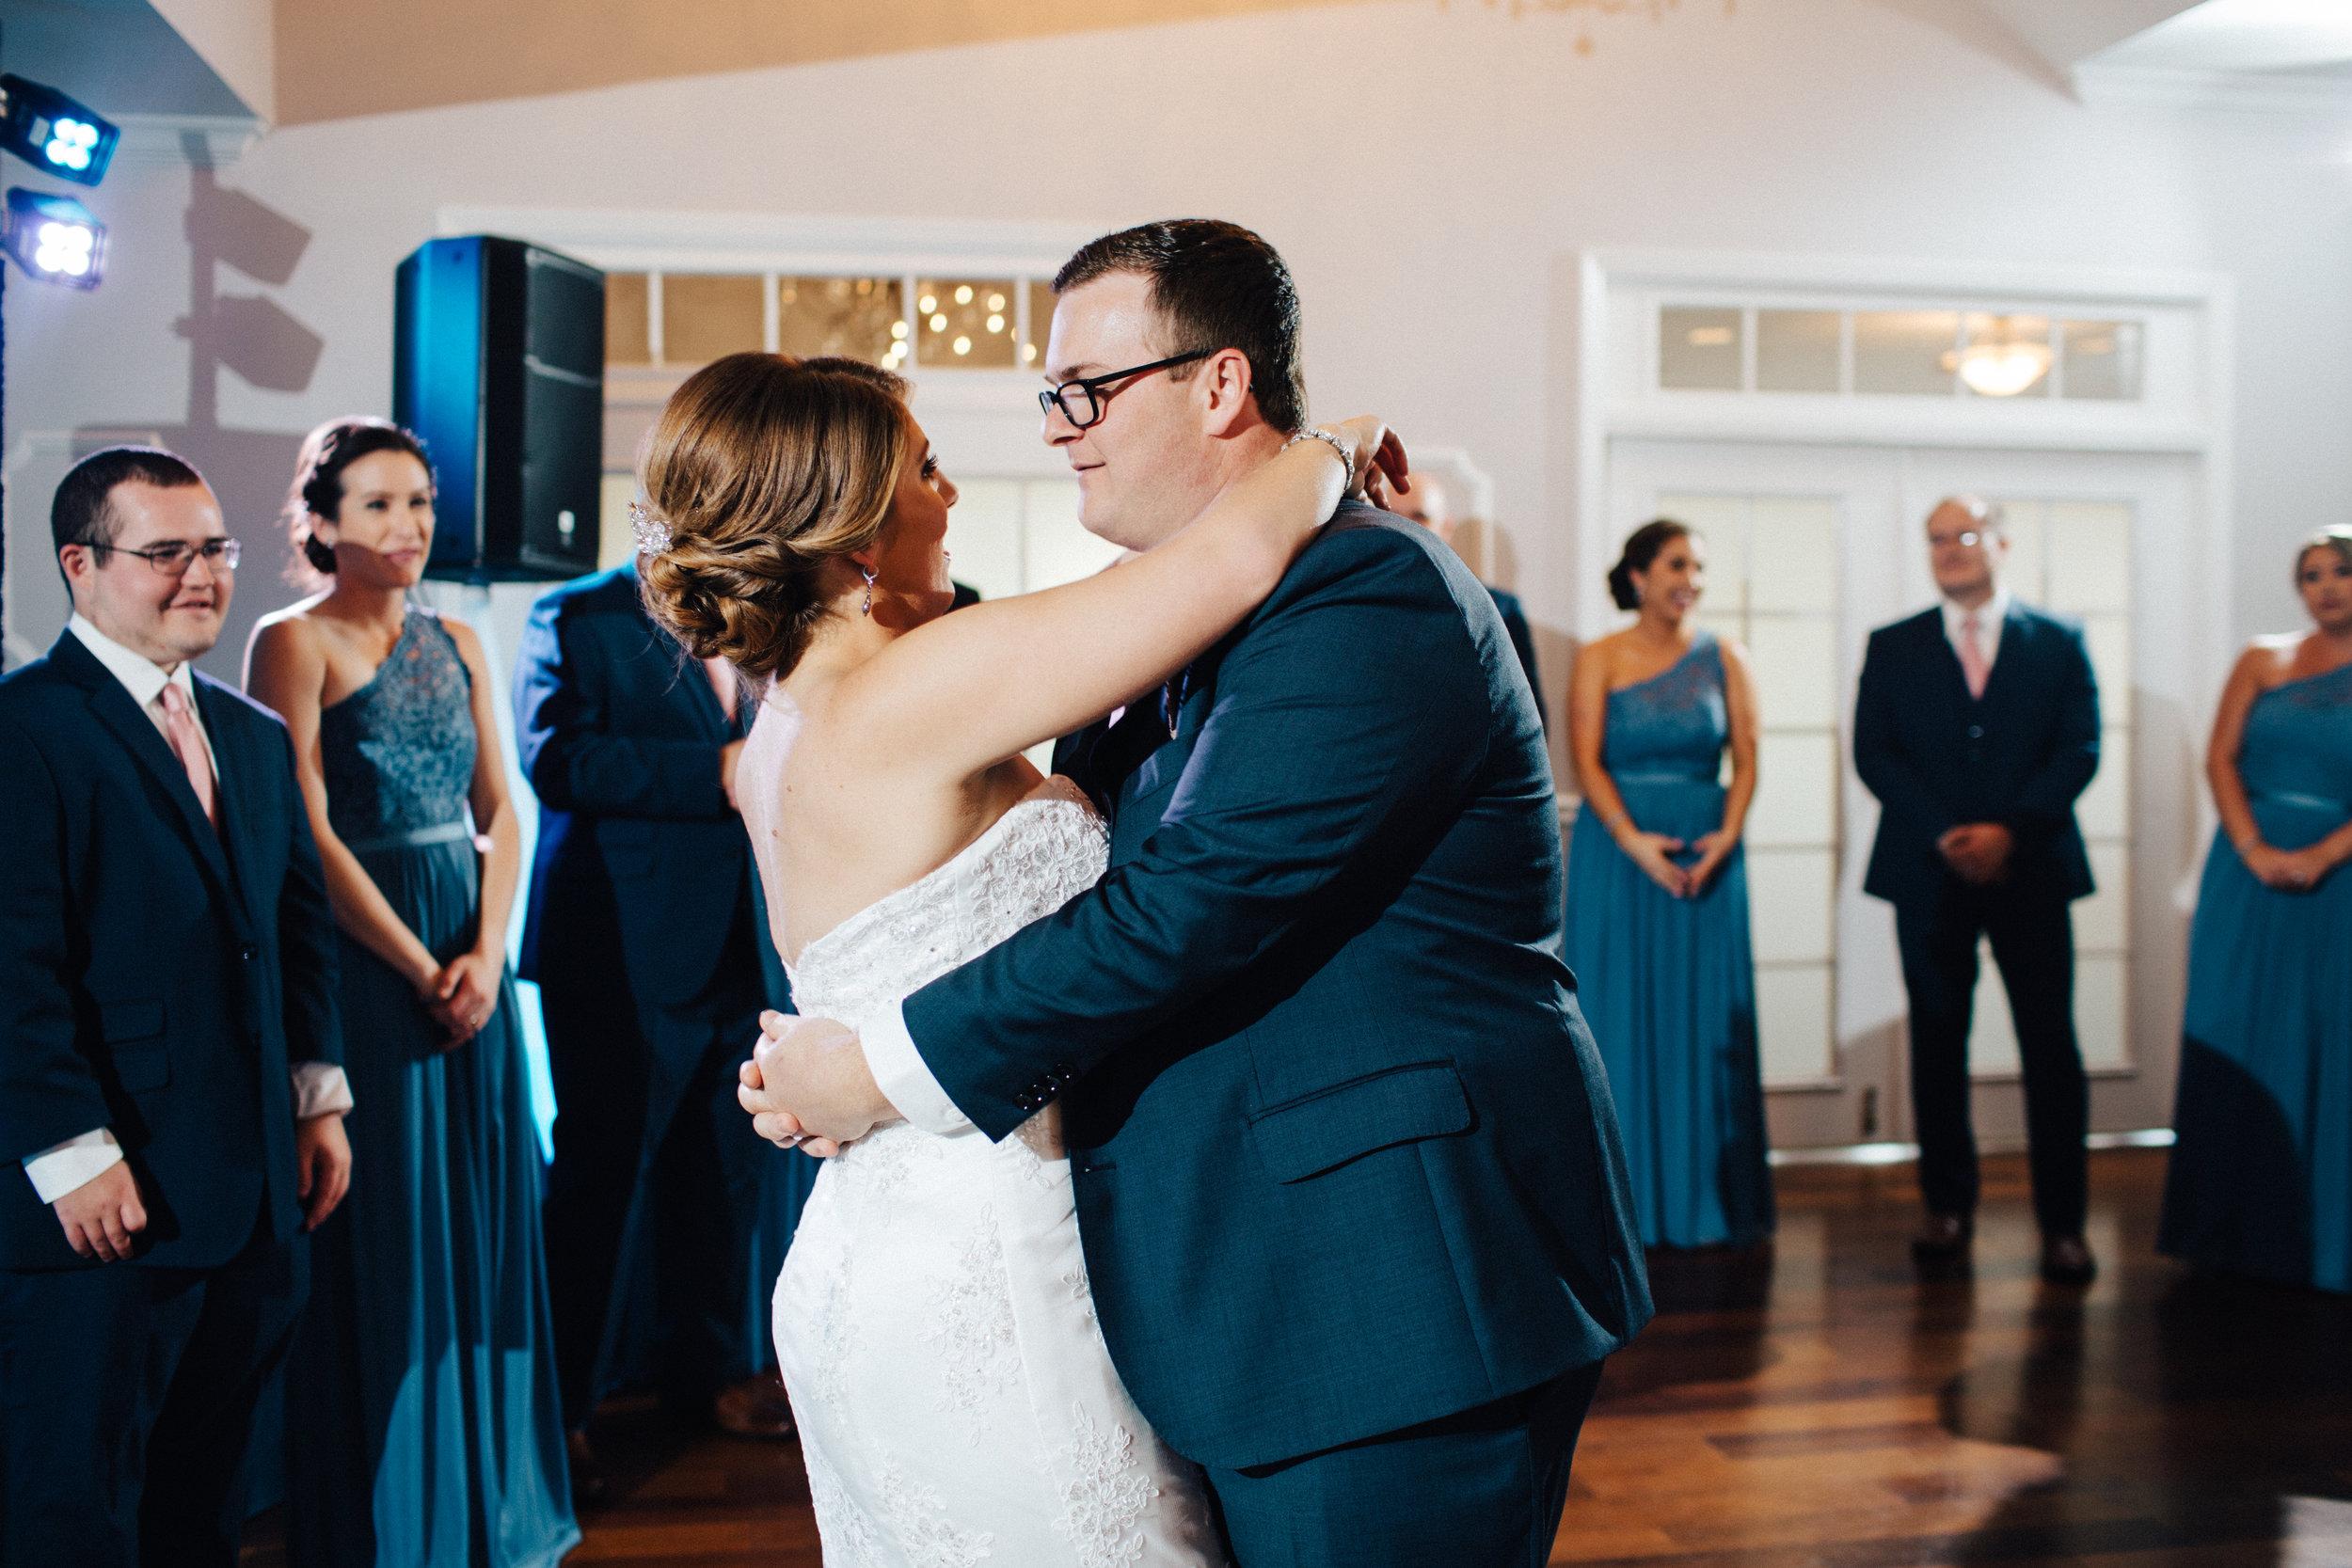 Tuskawilla Country Club Wedding Photographer-91.jpg